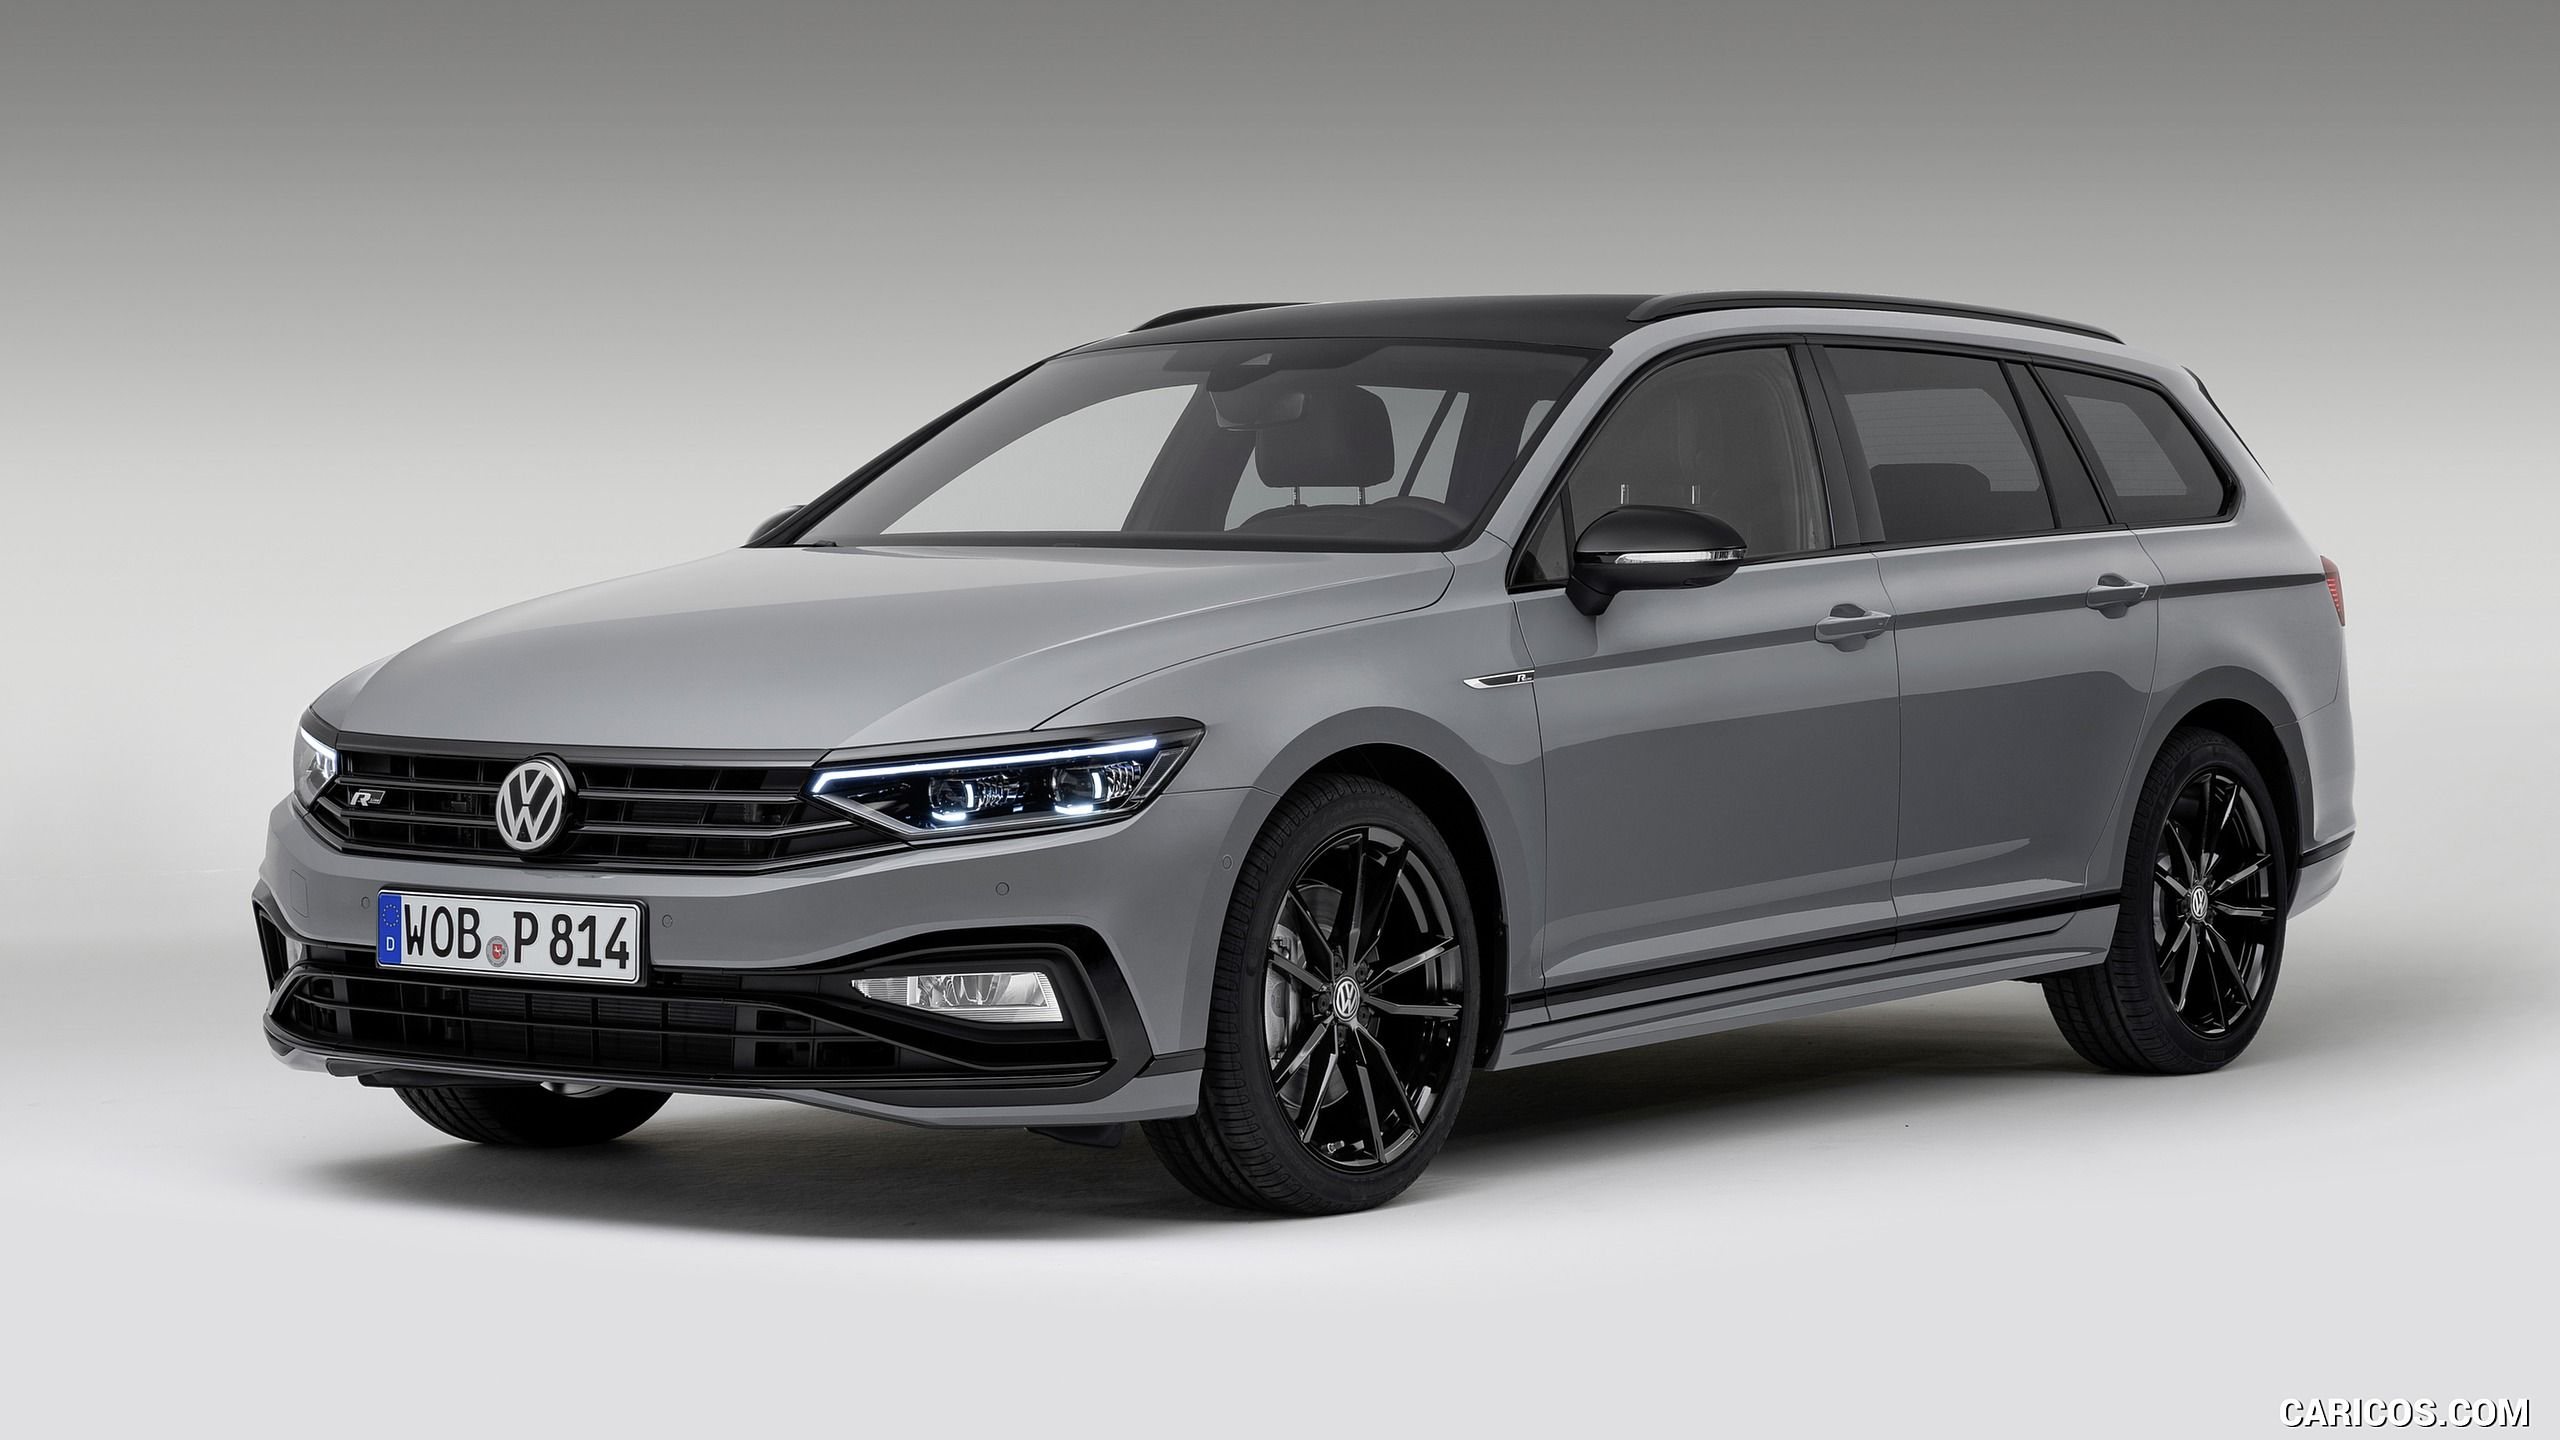 2019 Volkswagen Passat Variant R Line Edition Eu Spec Front Three Quarter Hd Jetta Wagon Vw Passat Vw Wagon